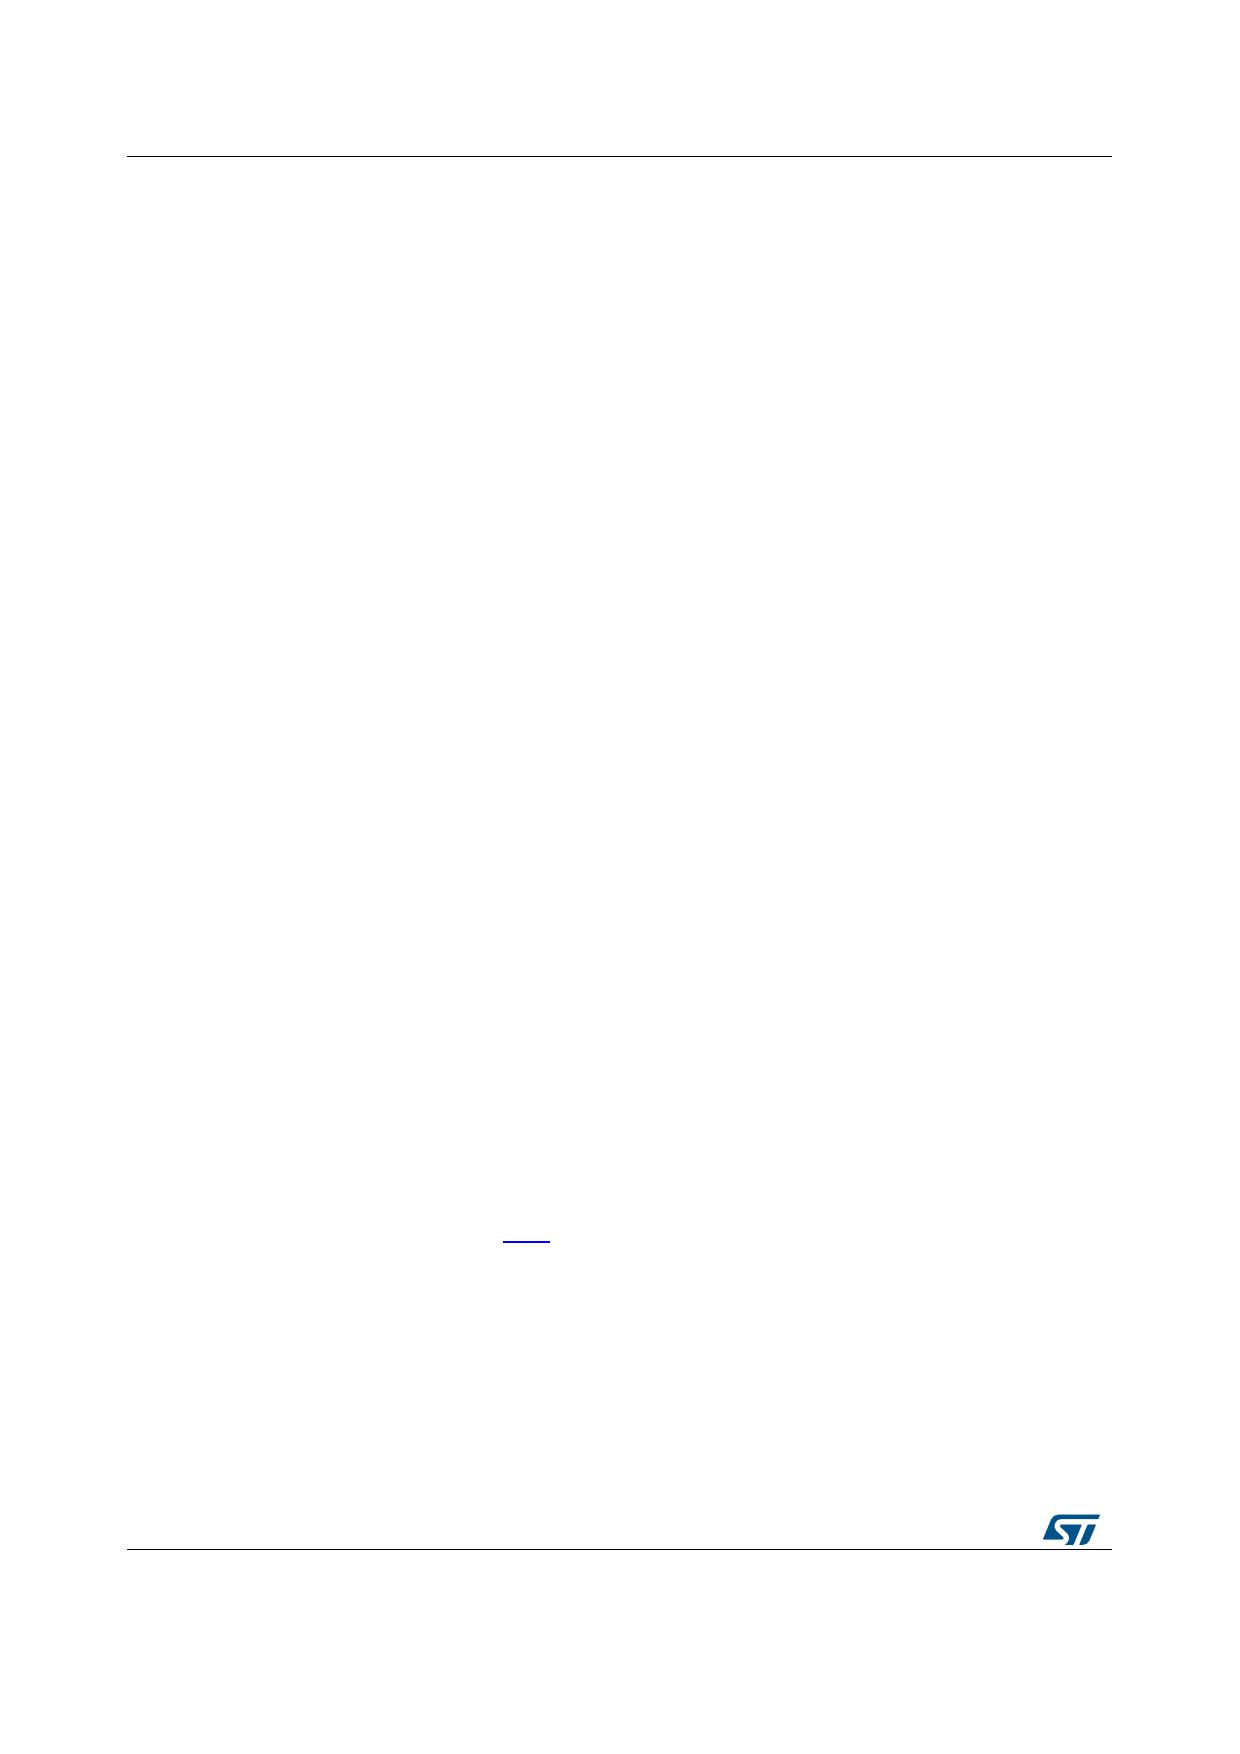 VNI8200XP-32 pdf, schematic